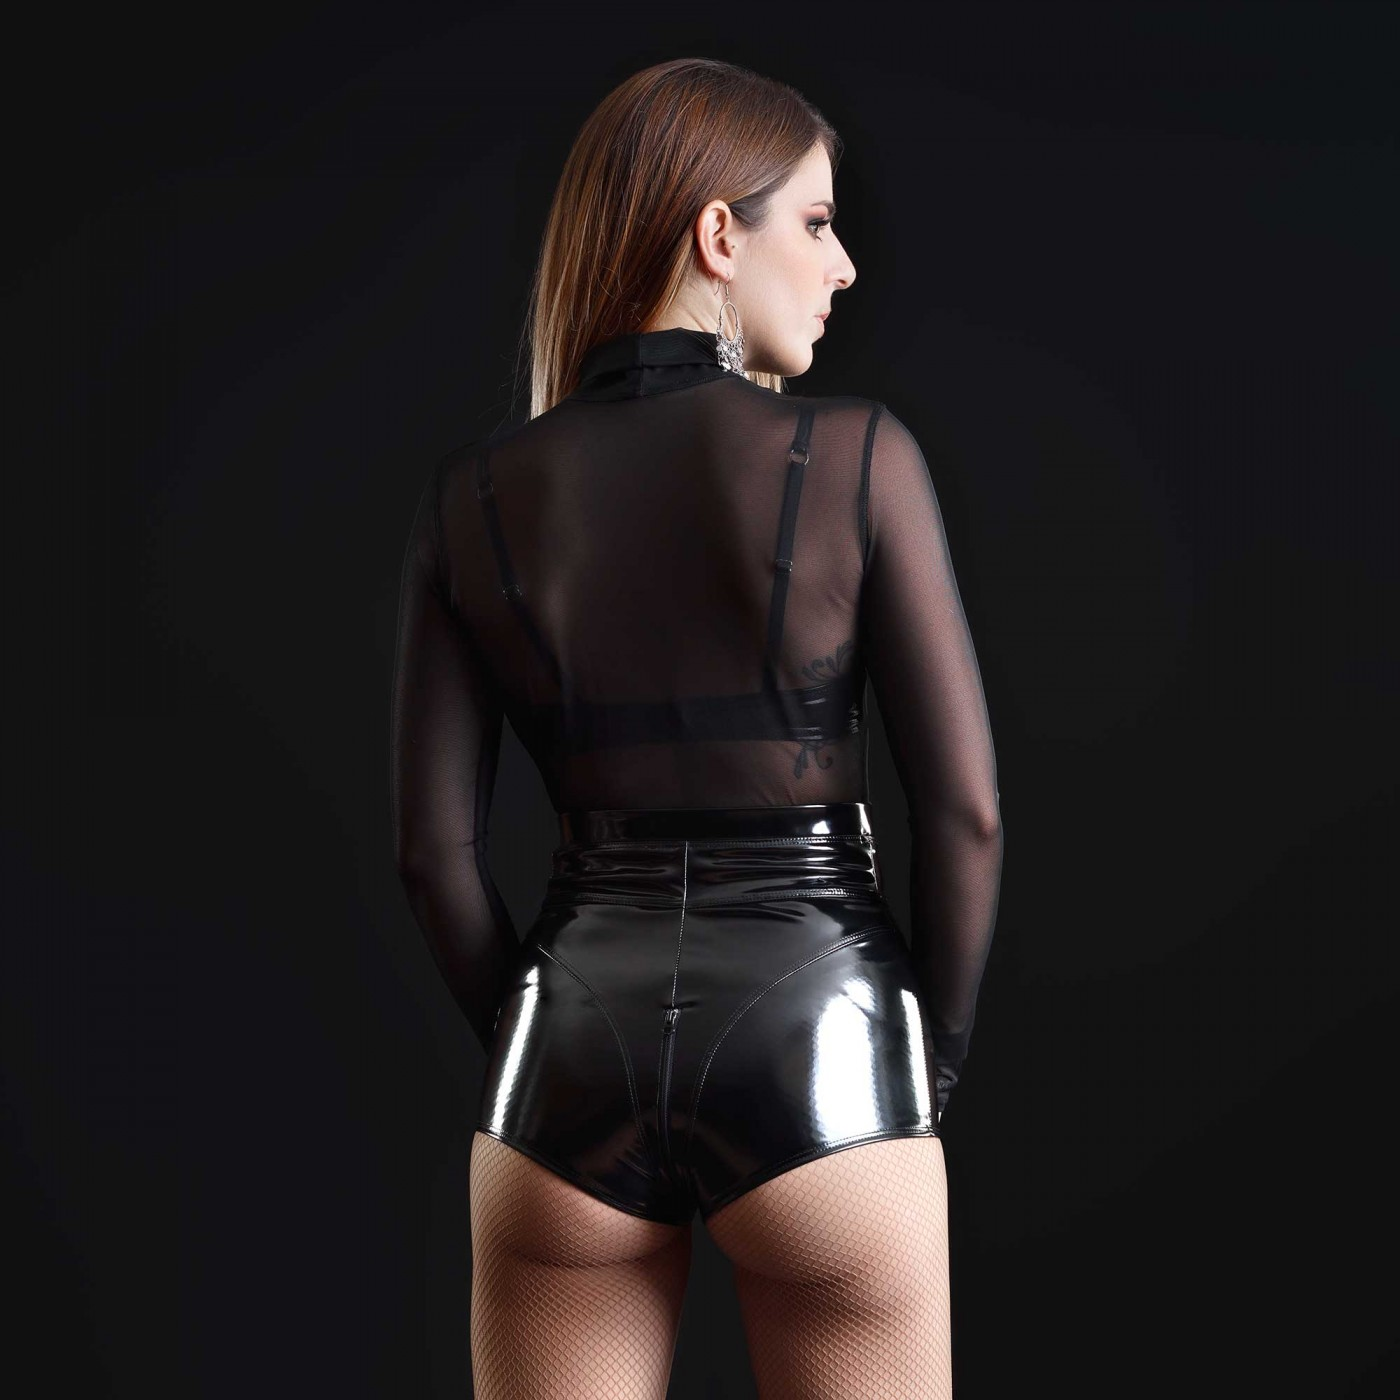 Candice, sexy black mesh top - Patrice Catanzaro